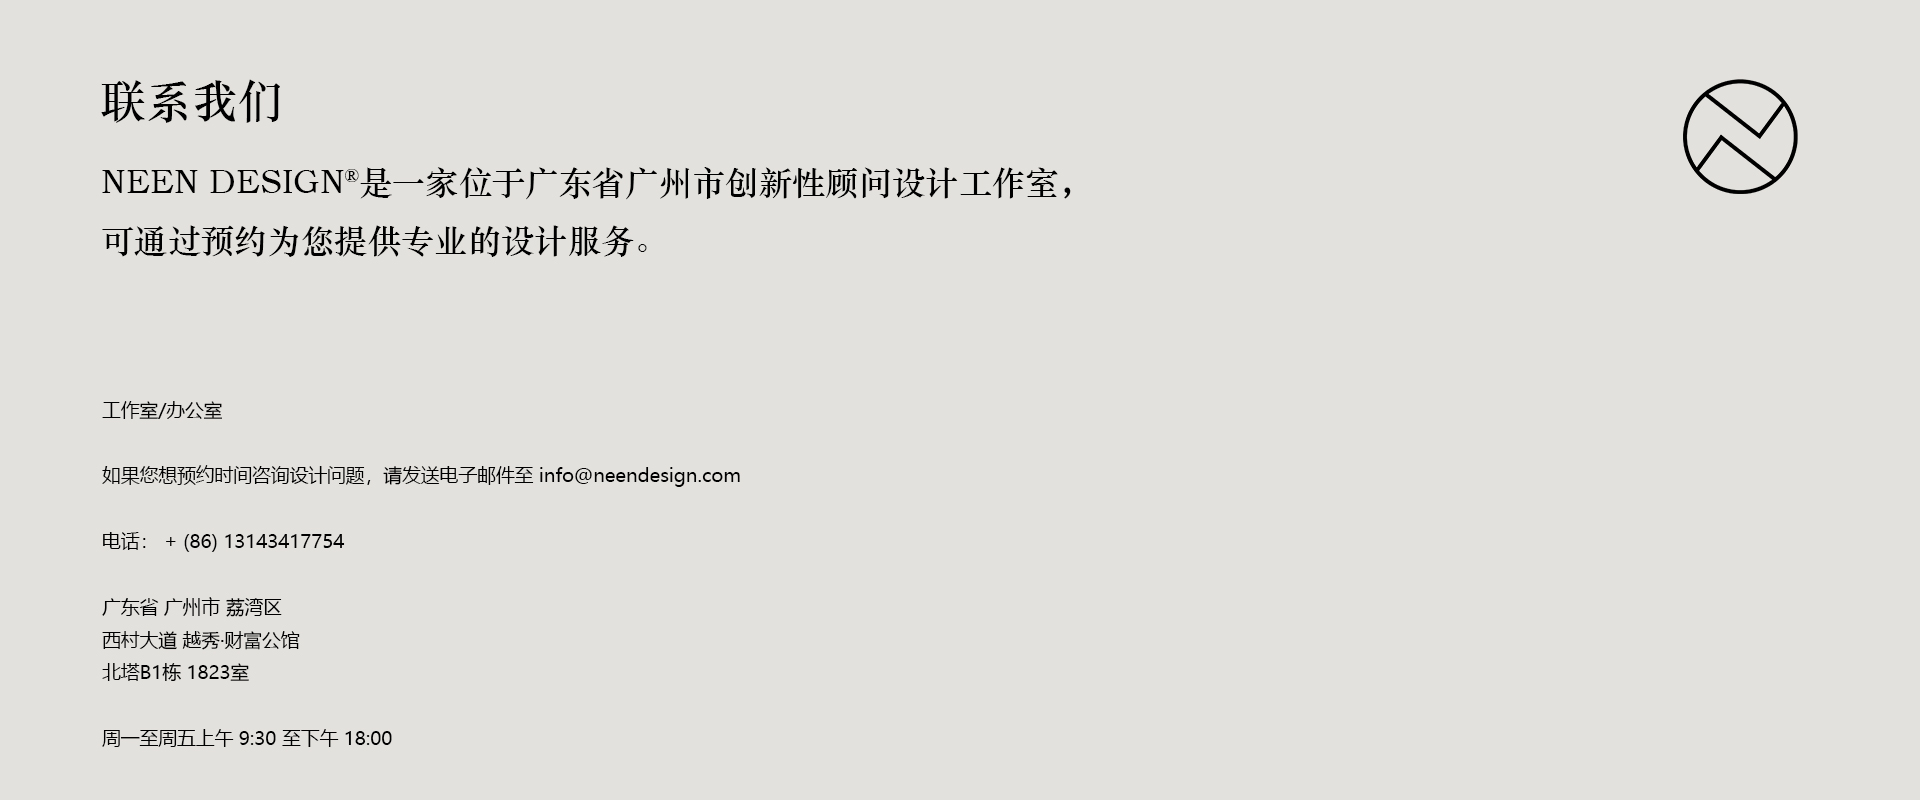 Engineered  台灯&落地灯